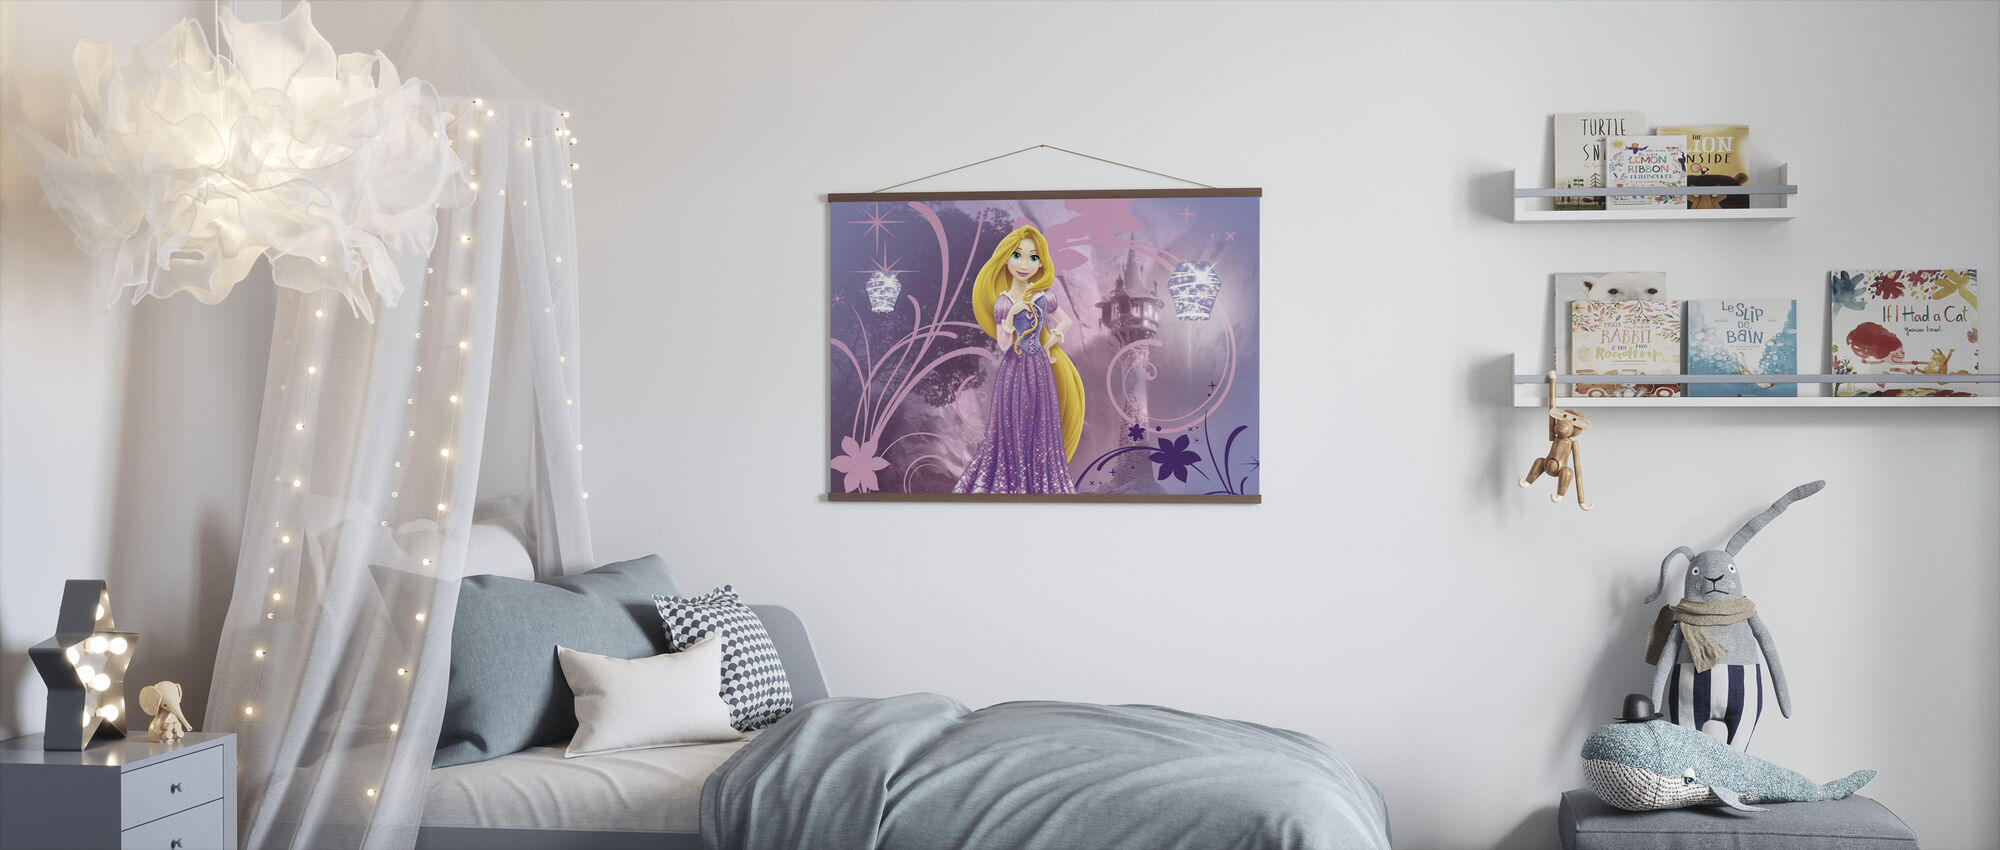 Disney Princess - Rapunzel - Juliste - Lastenhuone